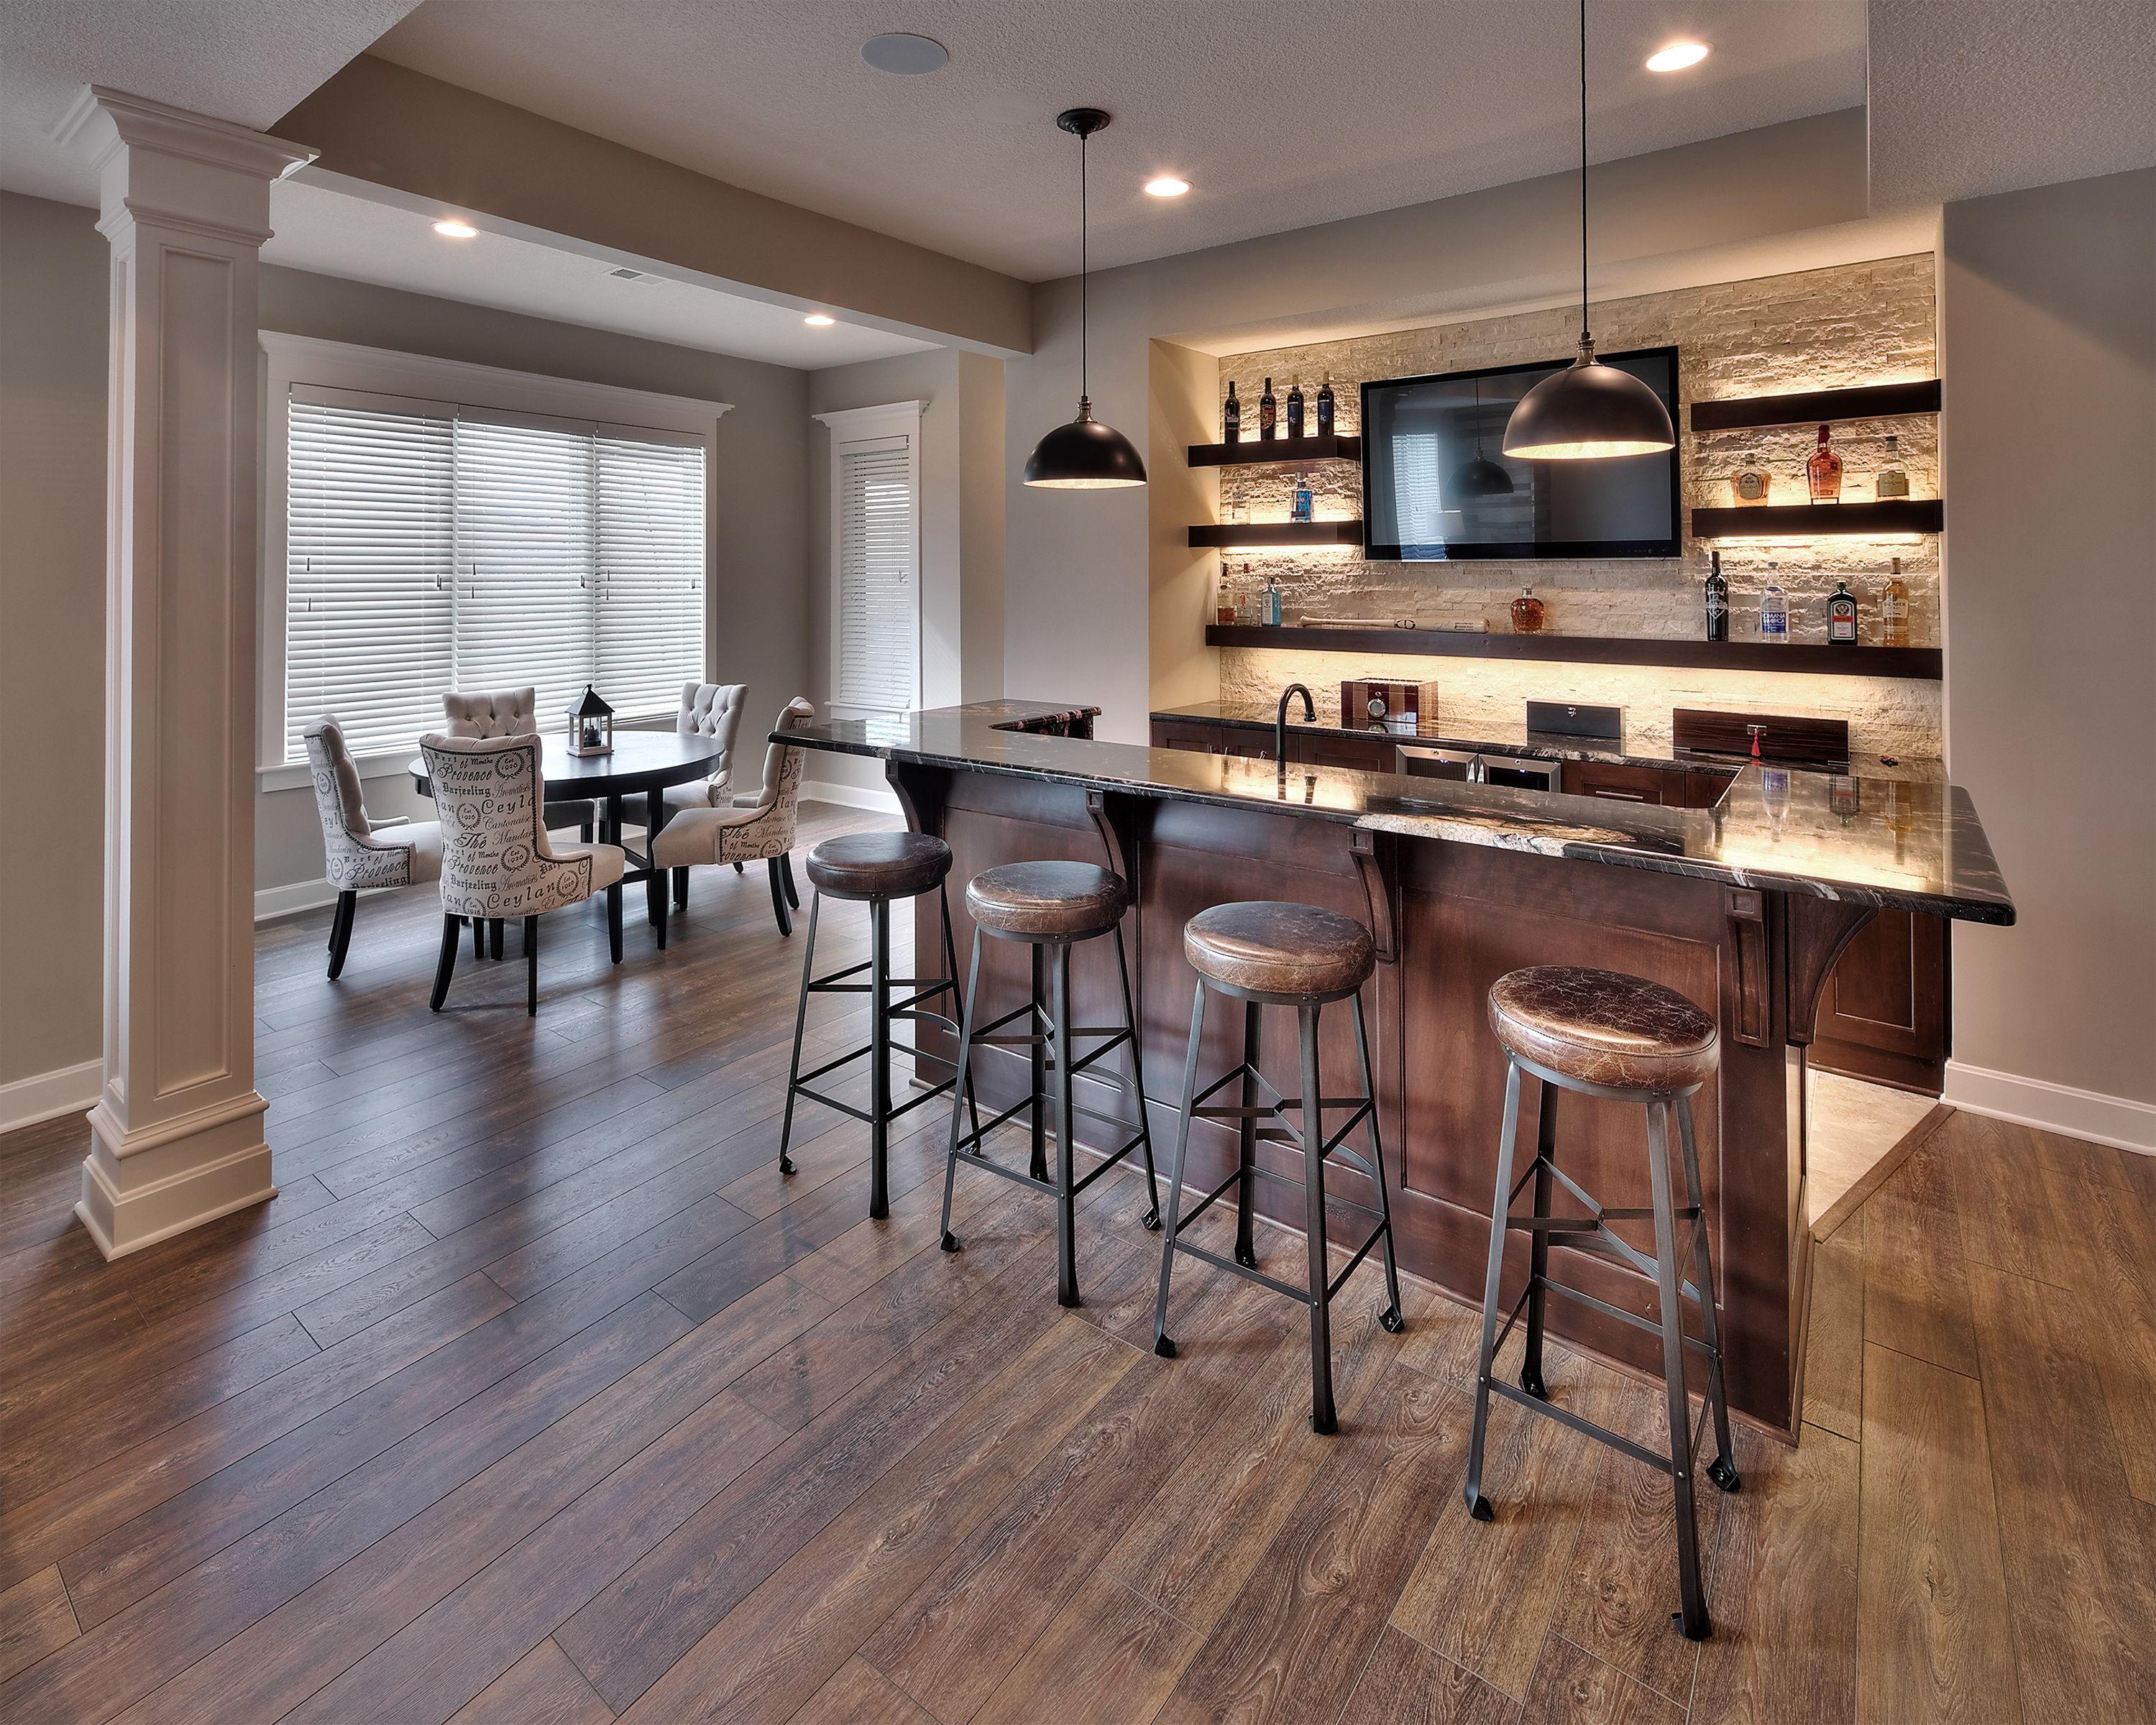 Home Bar Granite Counter Top Light Up Bar Mounted Tv Bar Stools Basement Bar Design Home Bar Designs Basement Bar Designs